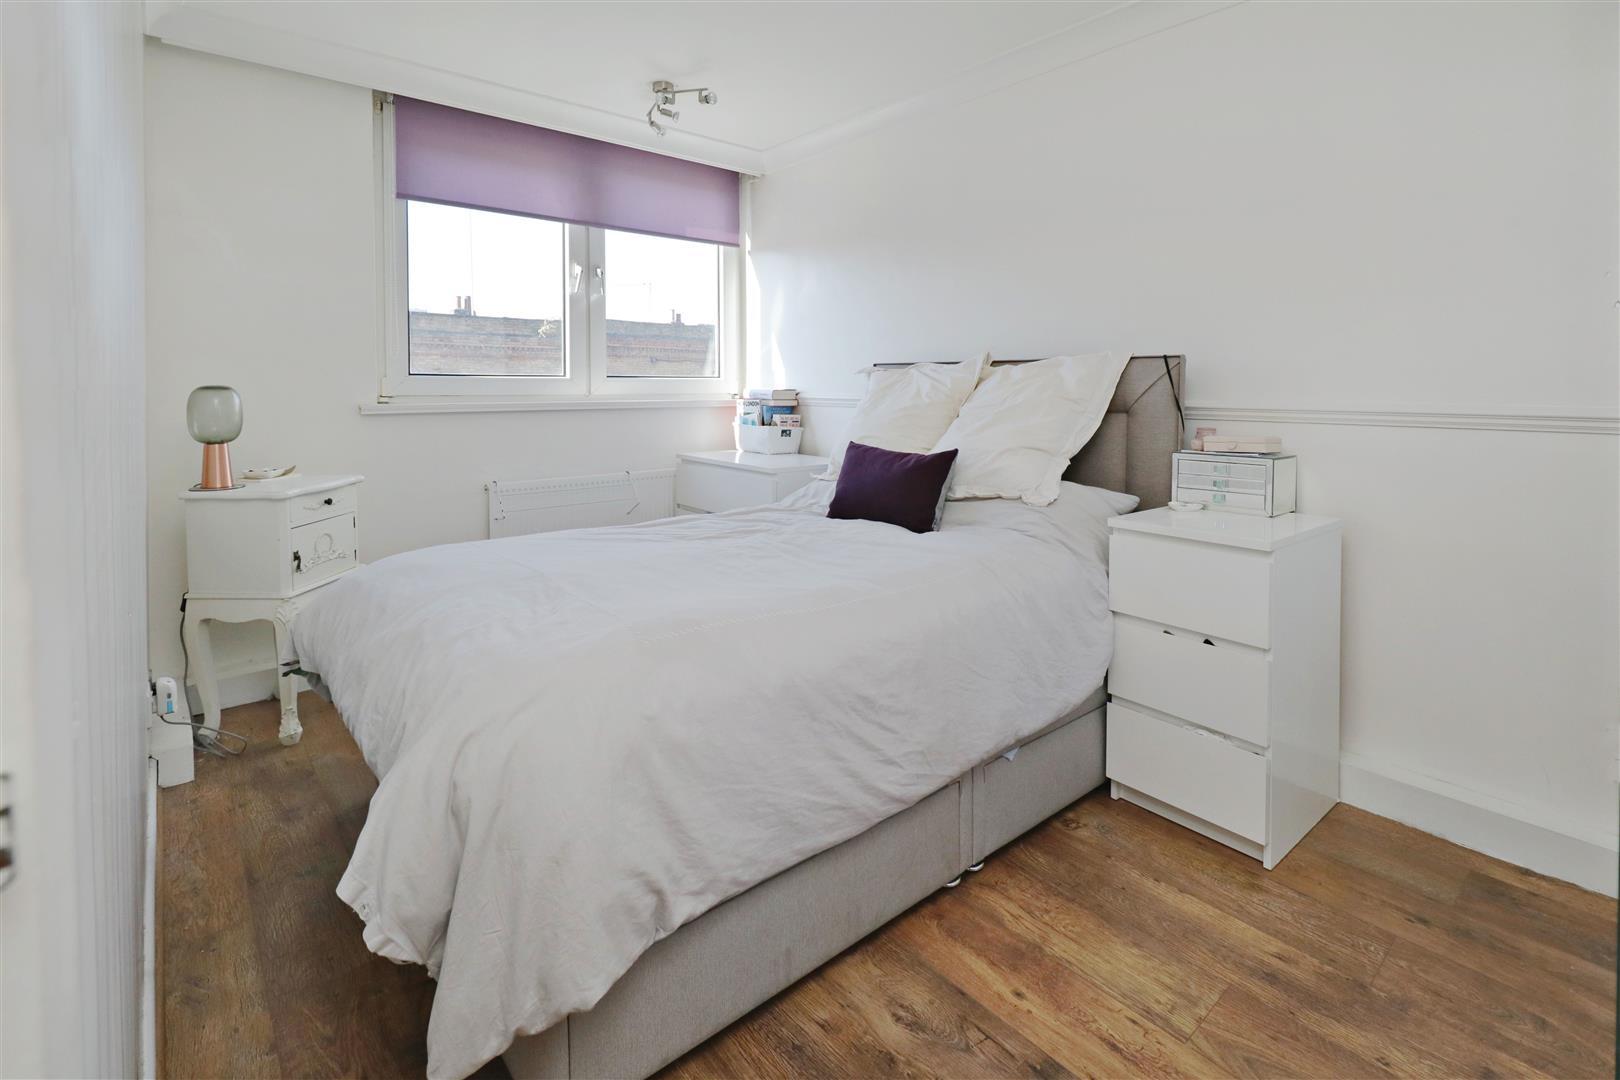 main bed furn.jpg